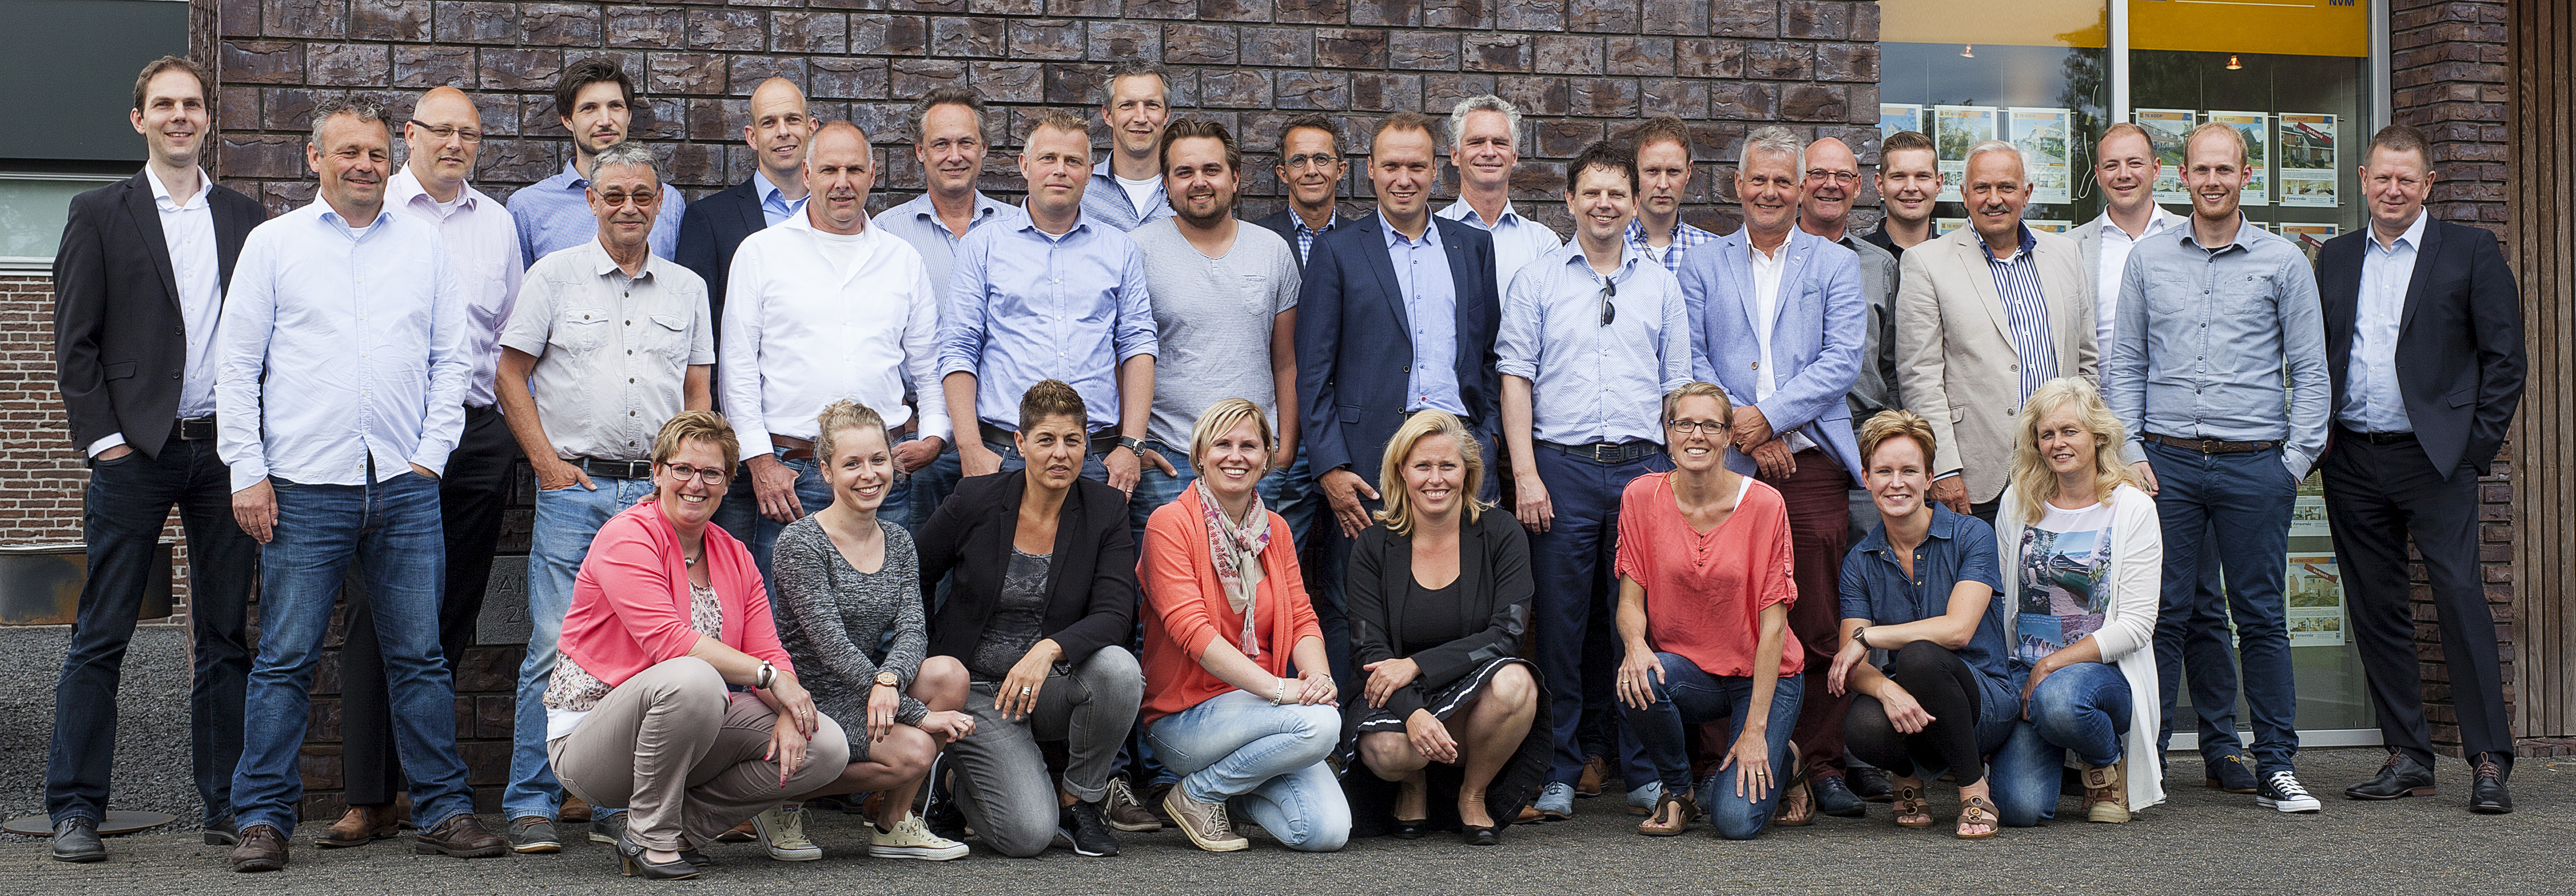 Team Friesland